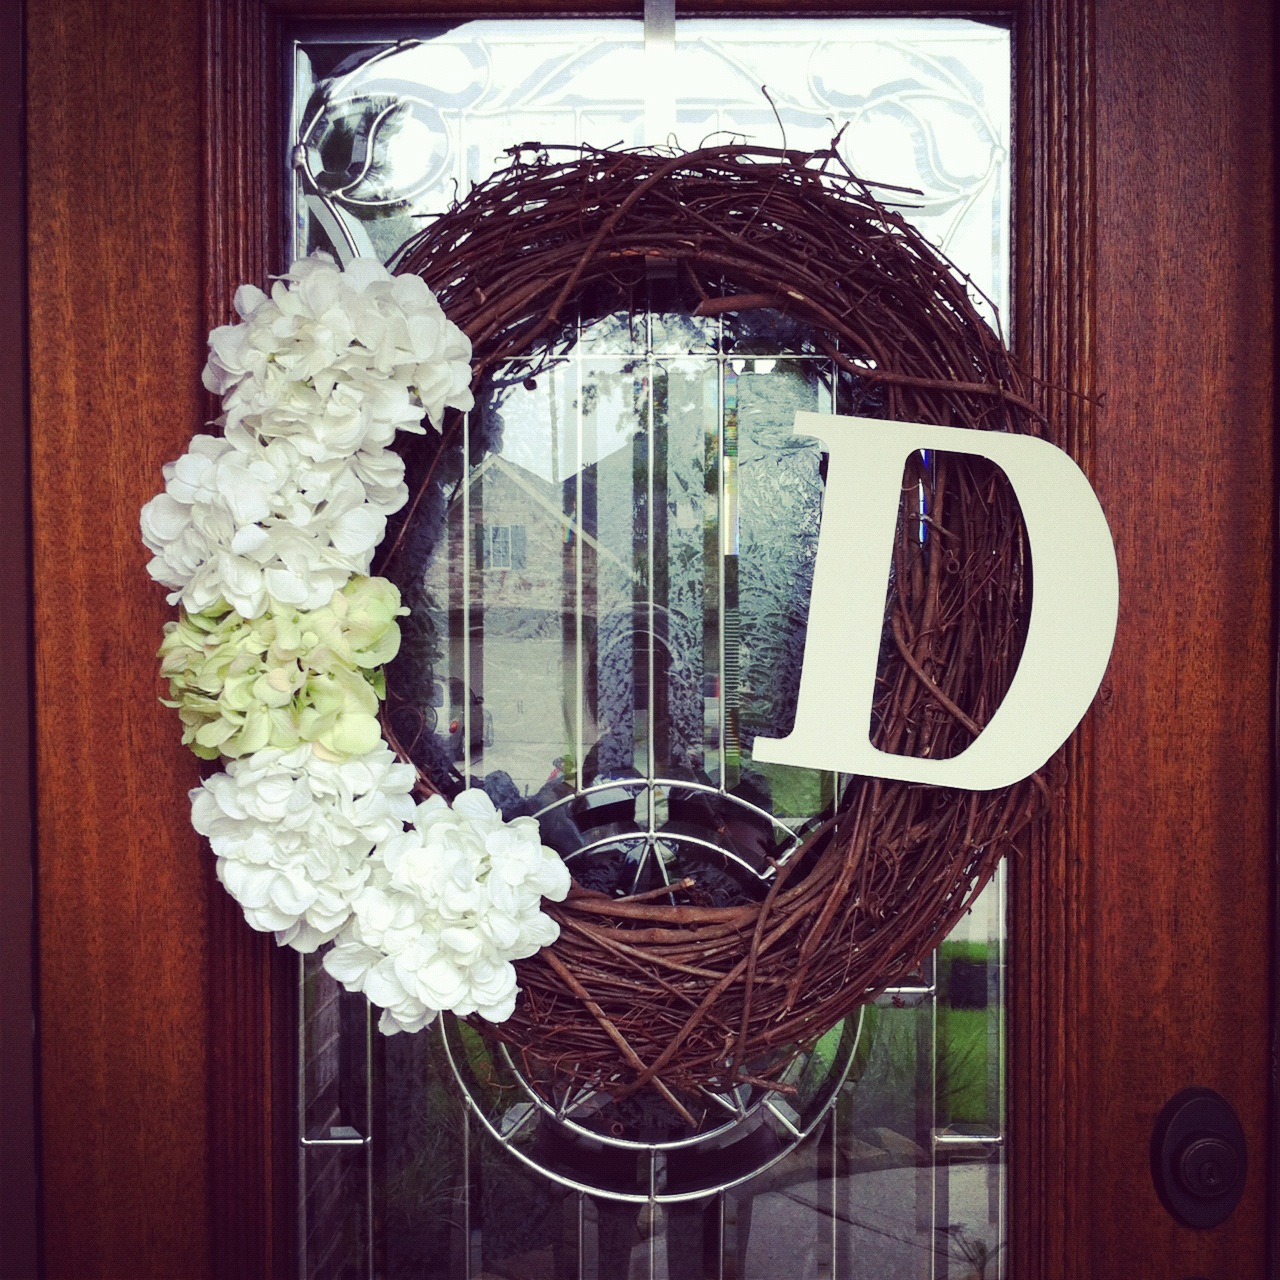 Diy Monogram Fall Wreath: Down With The Dearmore's: {DIY Monogram Wreath}